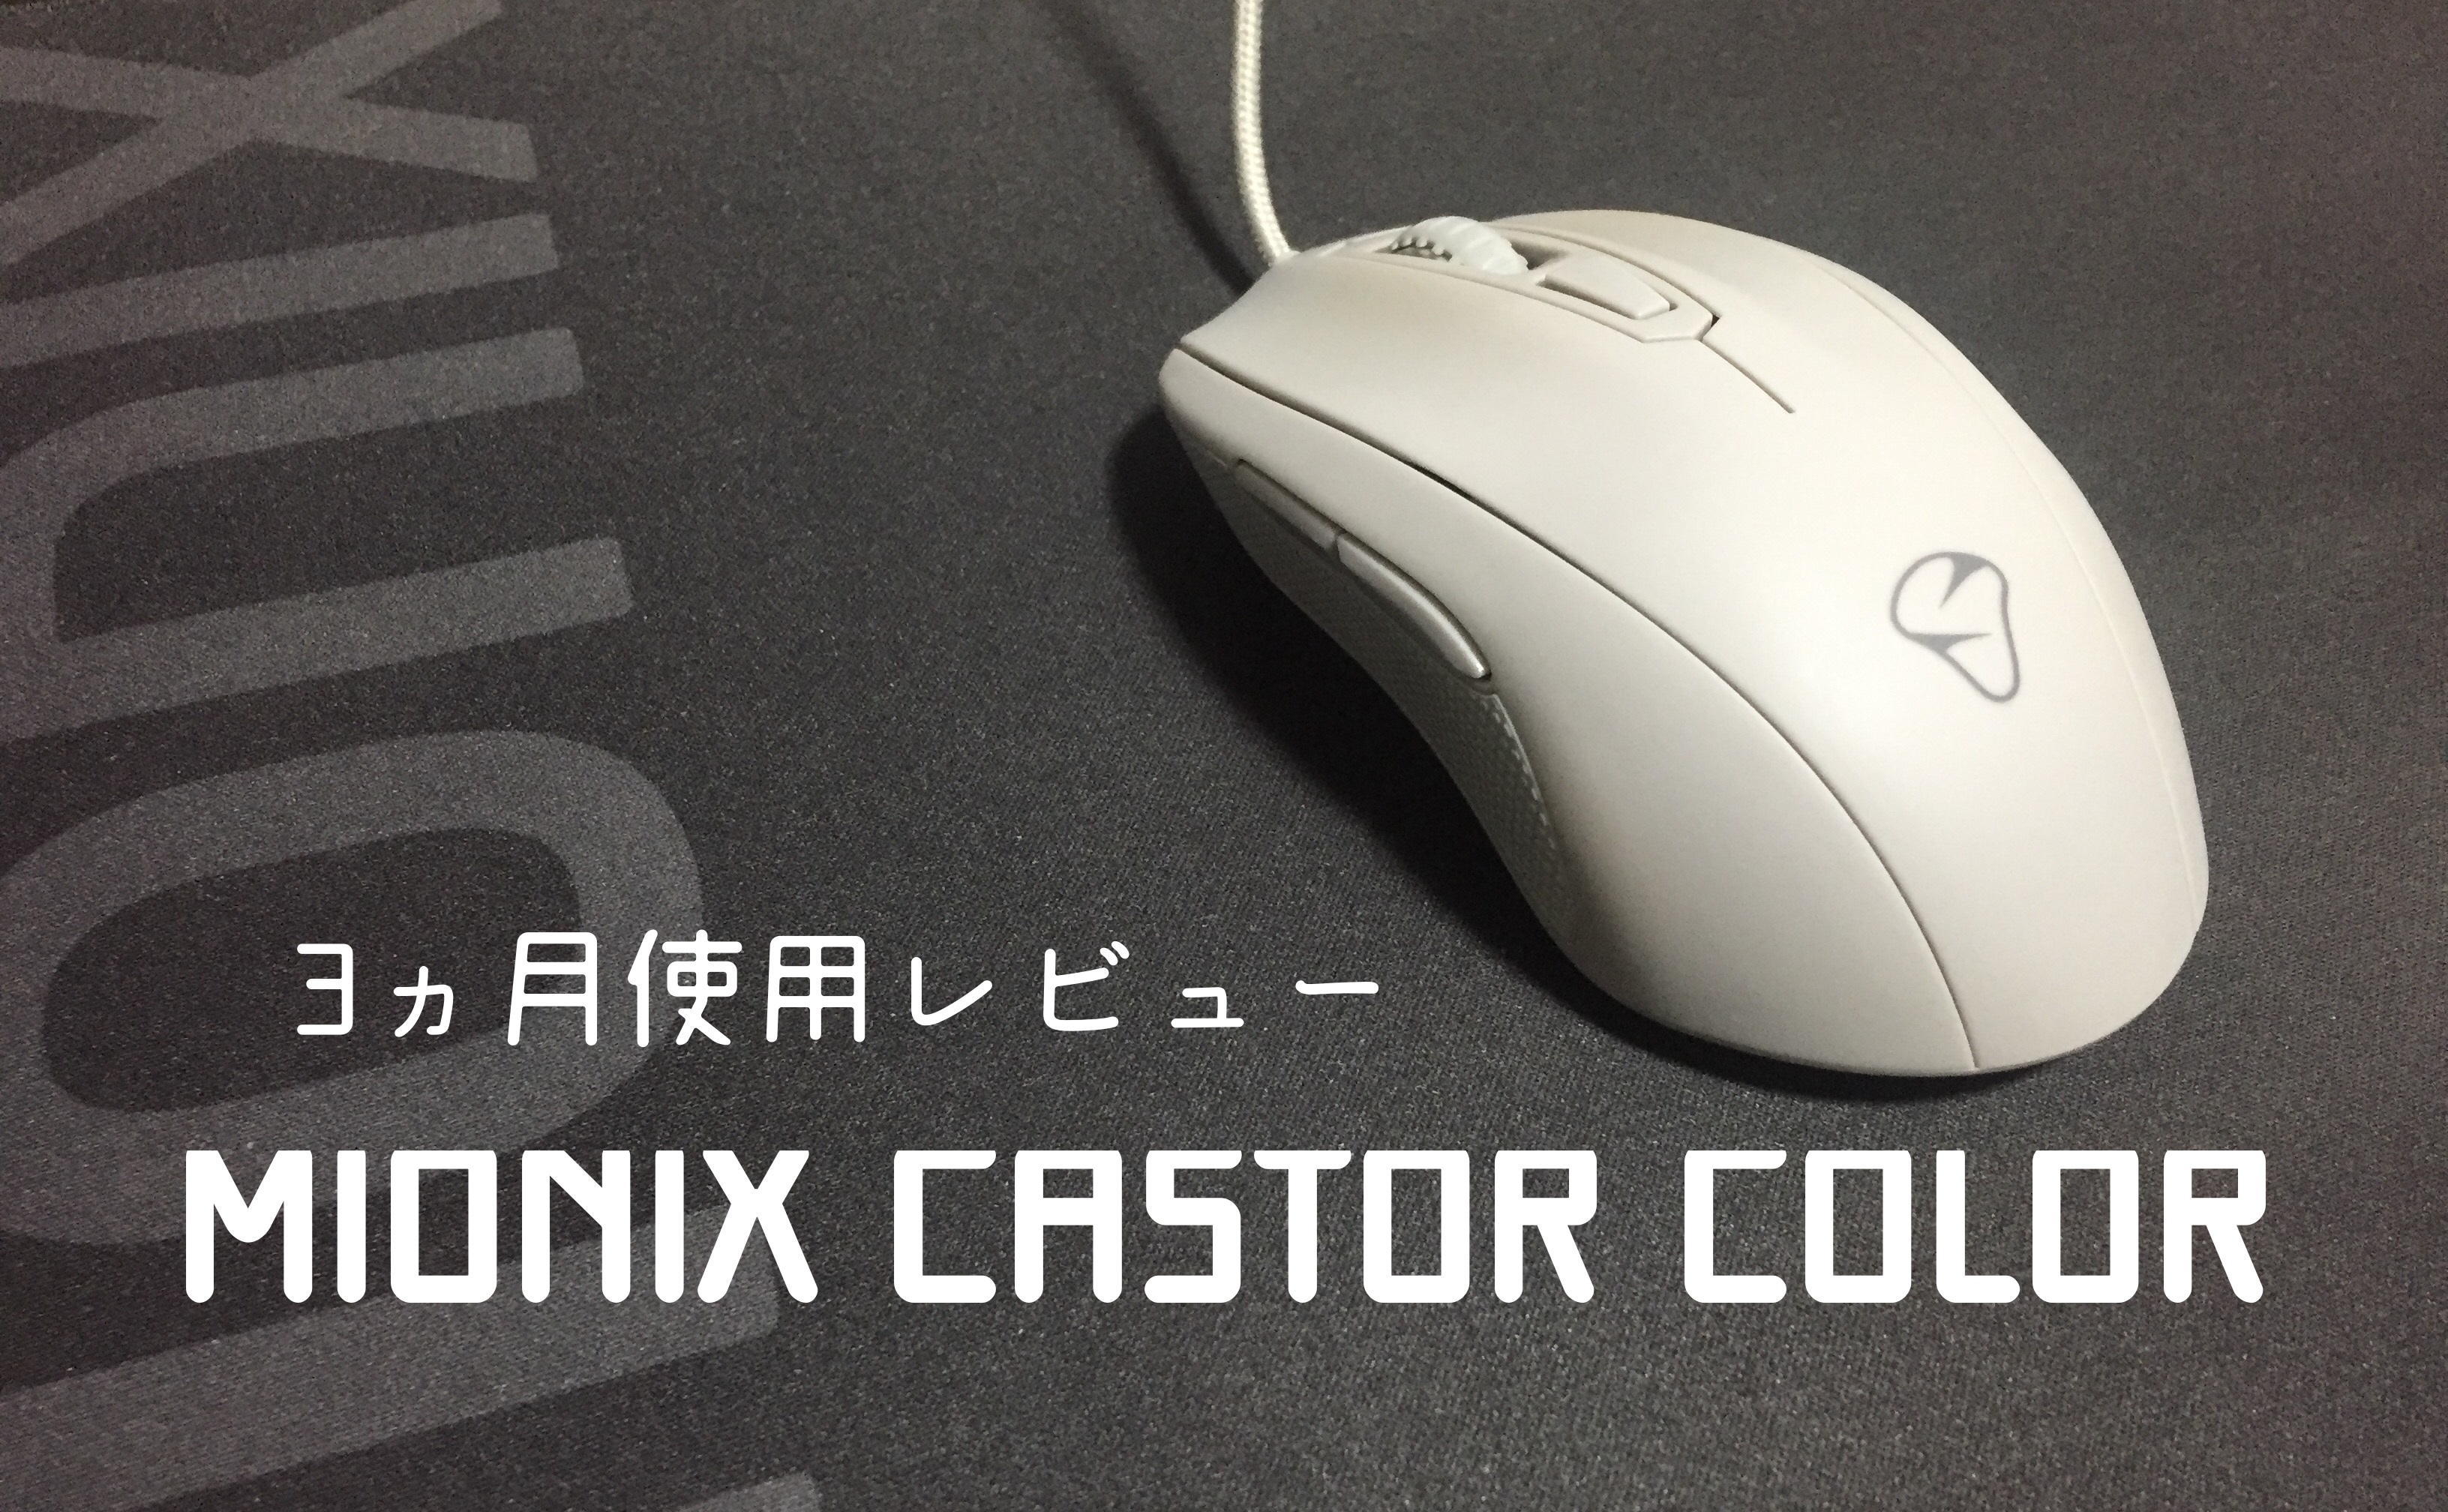 【Discord】サーバーリージョンに日本サーバーが追加!より快適なチャットが可能に